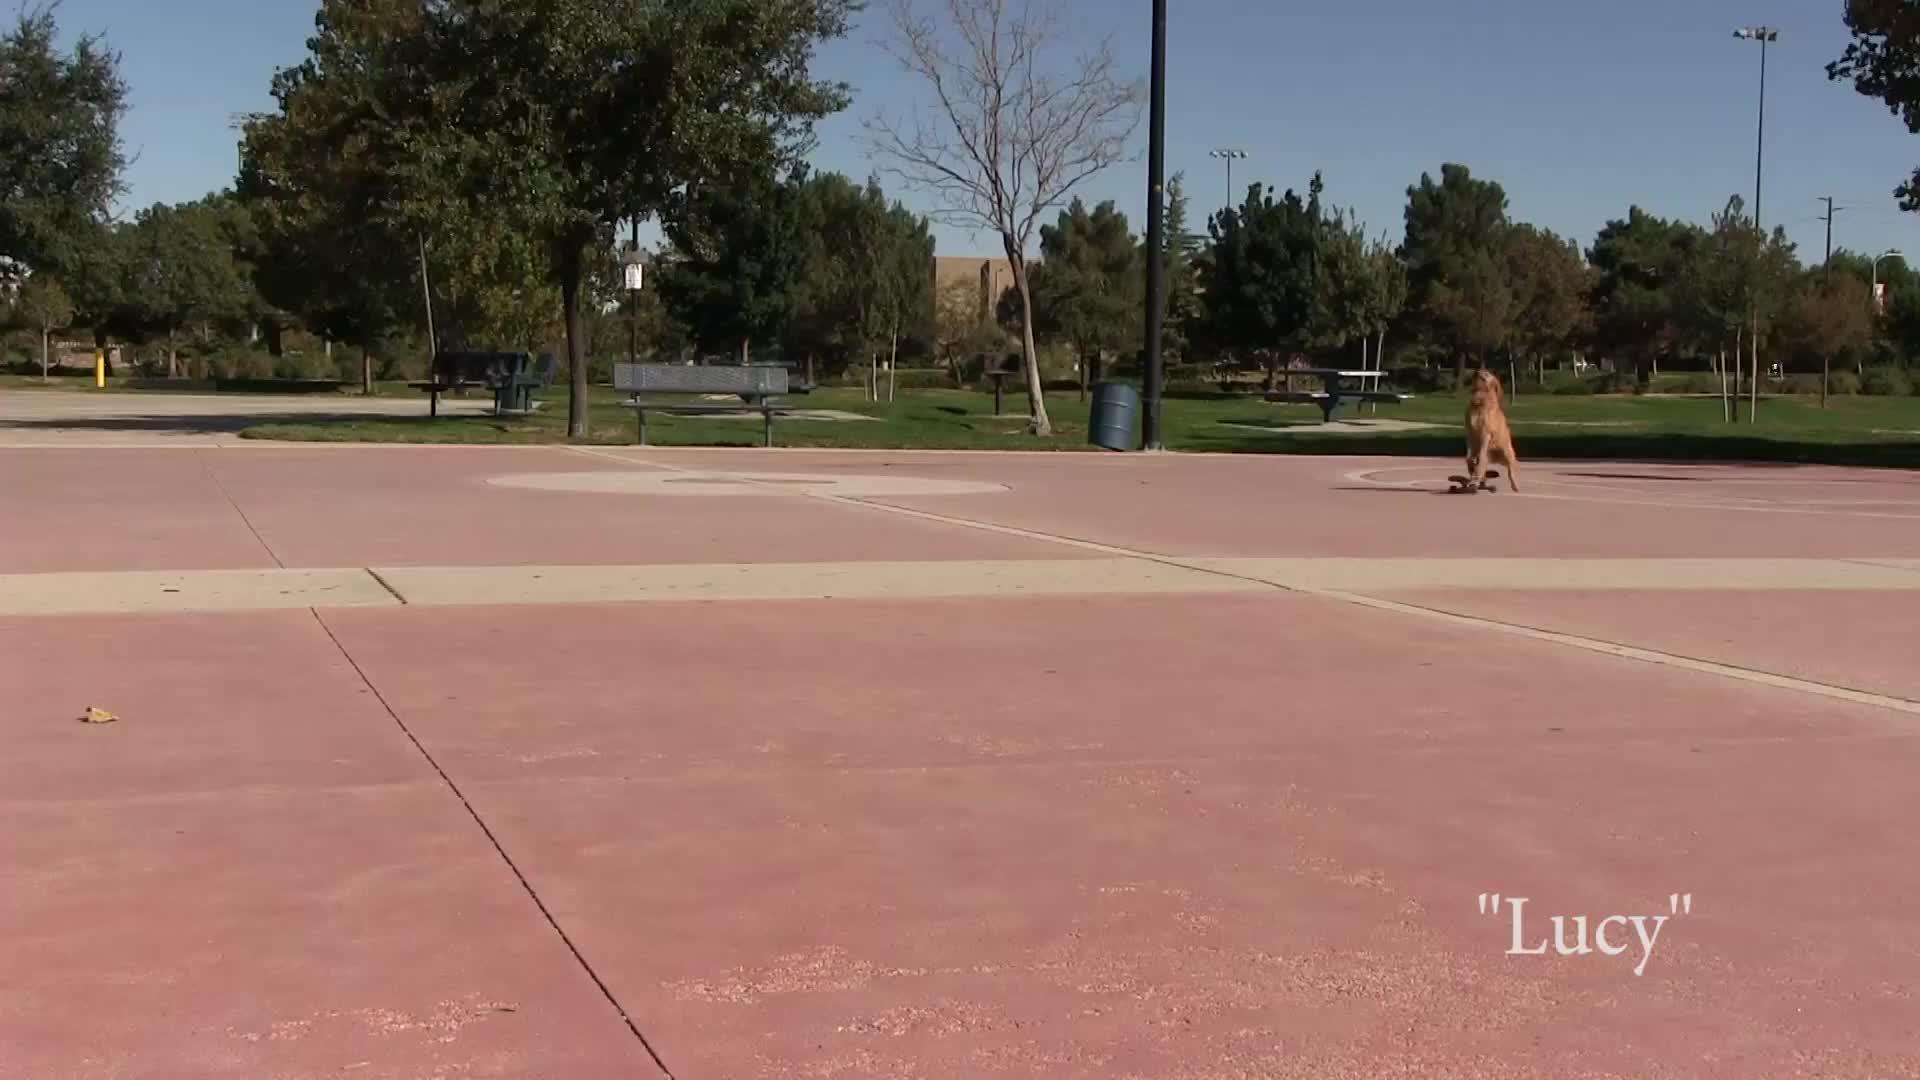 Lucy skateboarding GIFs